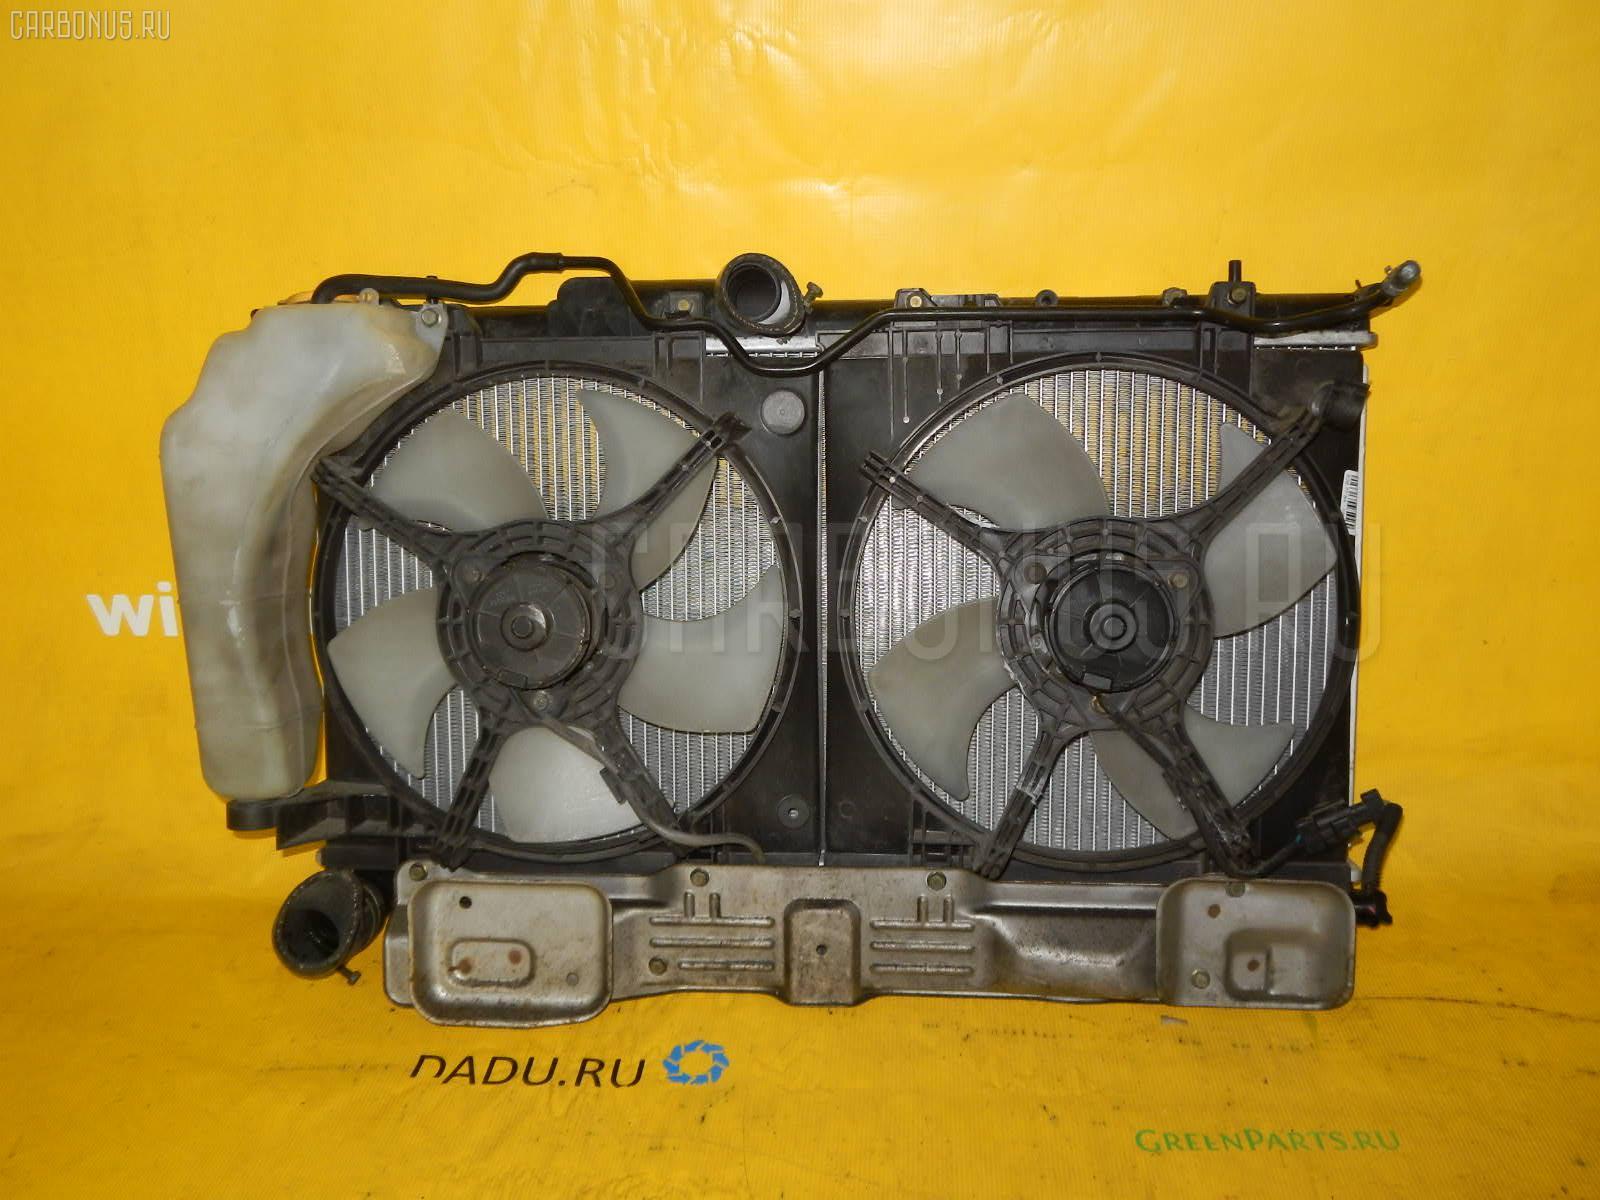 Радиатор ДВС SUBARU LEGACY B4 BE5 EJ20-TT Фото 1